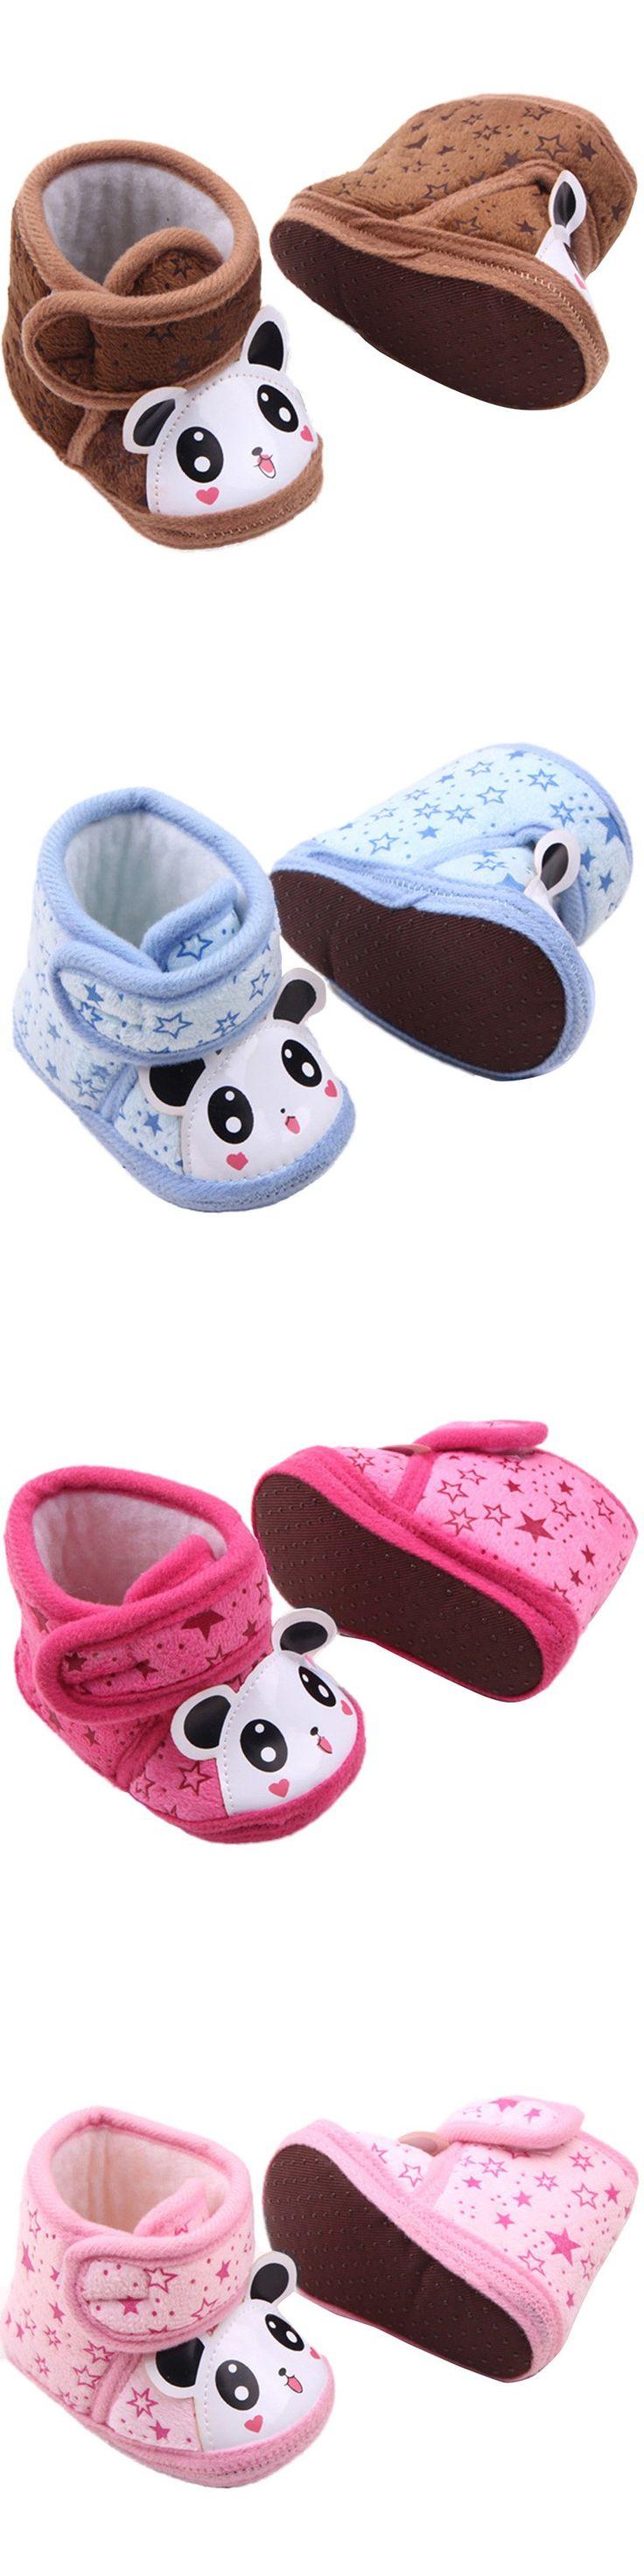 Newborn Baby Boots Boy Girl Warm Anti-slip Panda Soft Sole Slipper Shoes 0-12 M $2.36